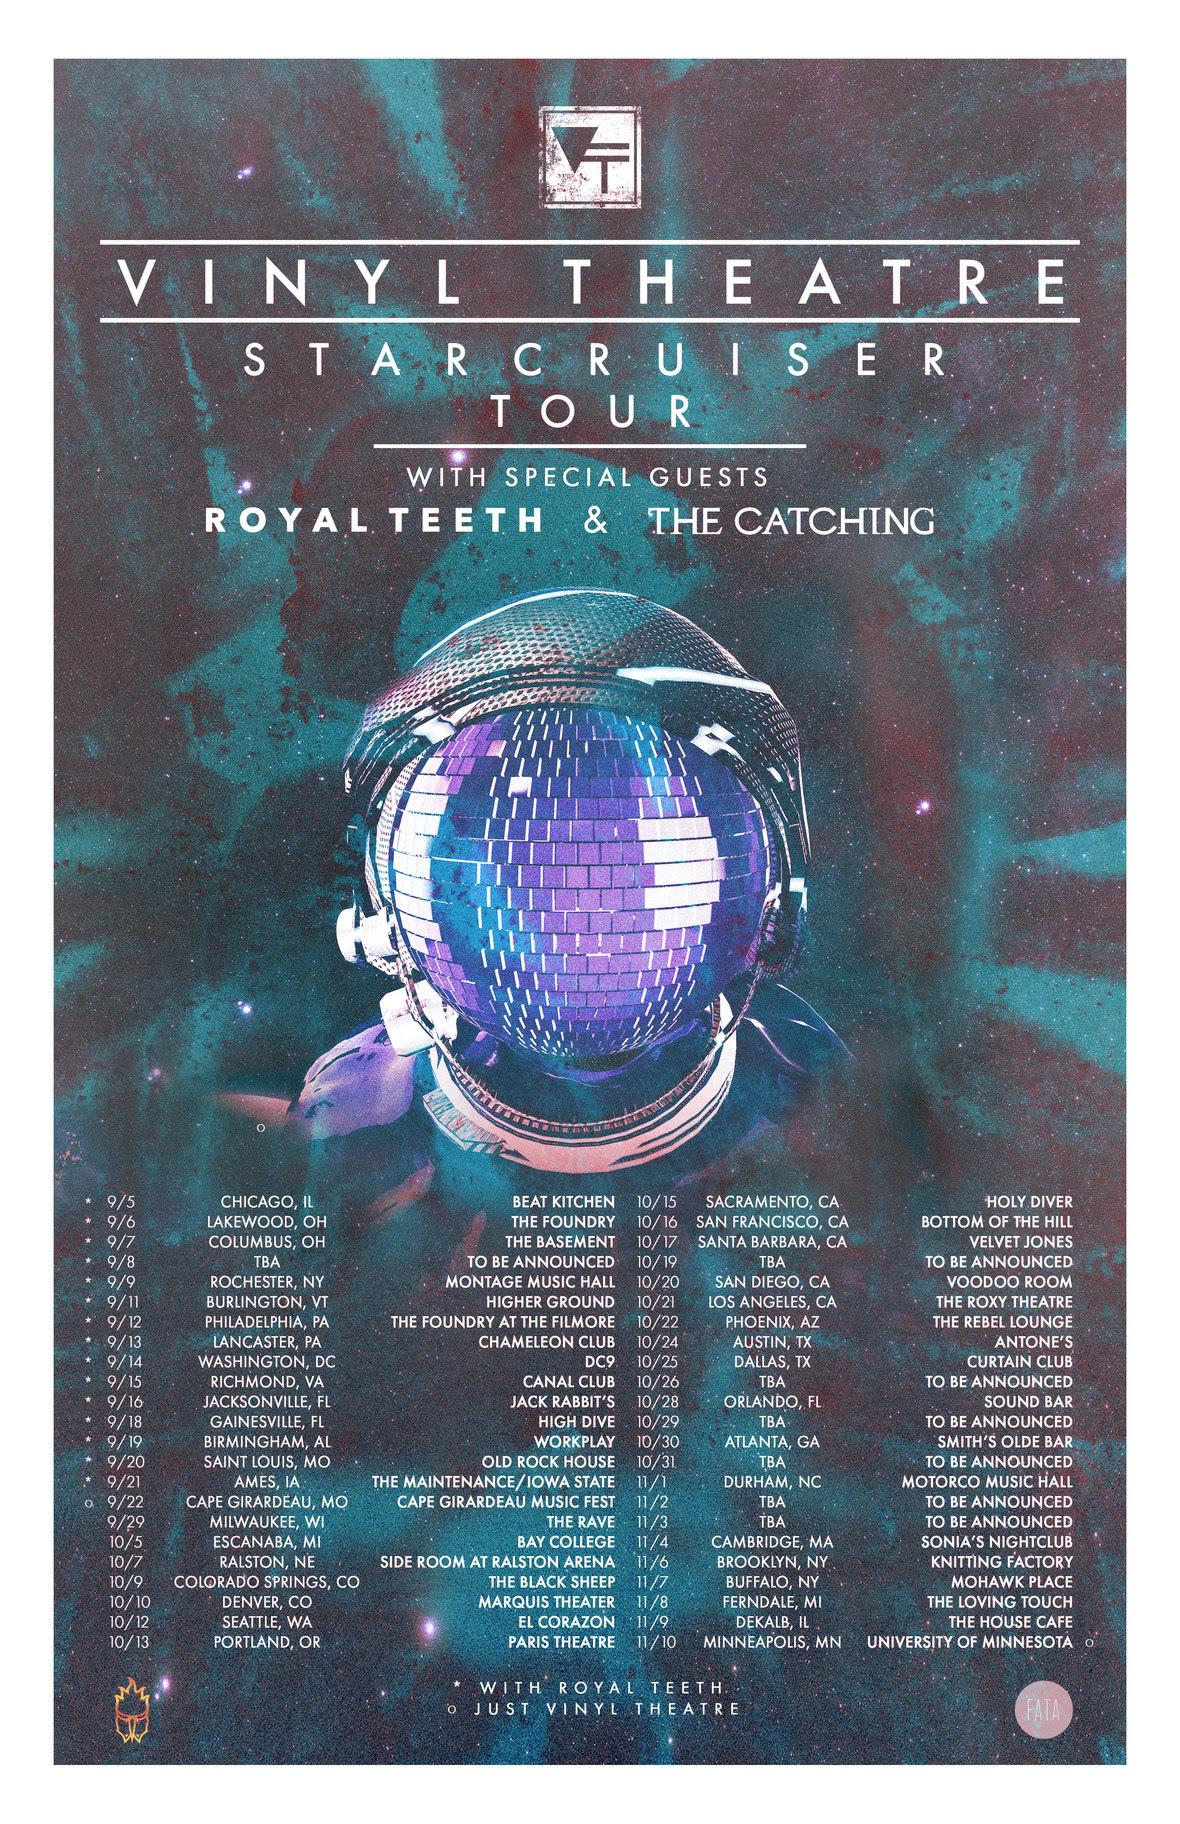 vinyl theatre starcruiser tour